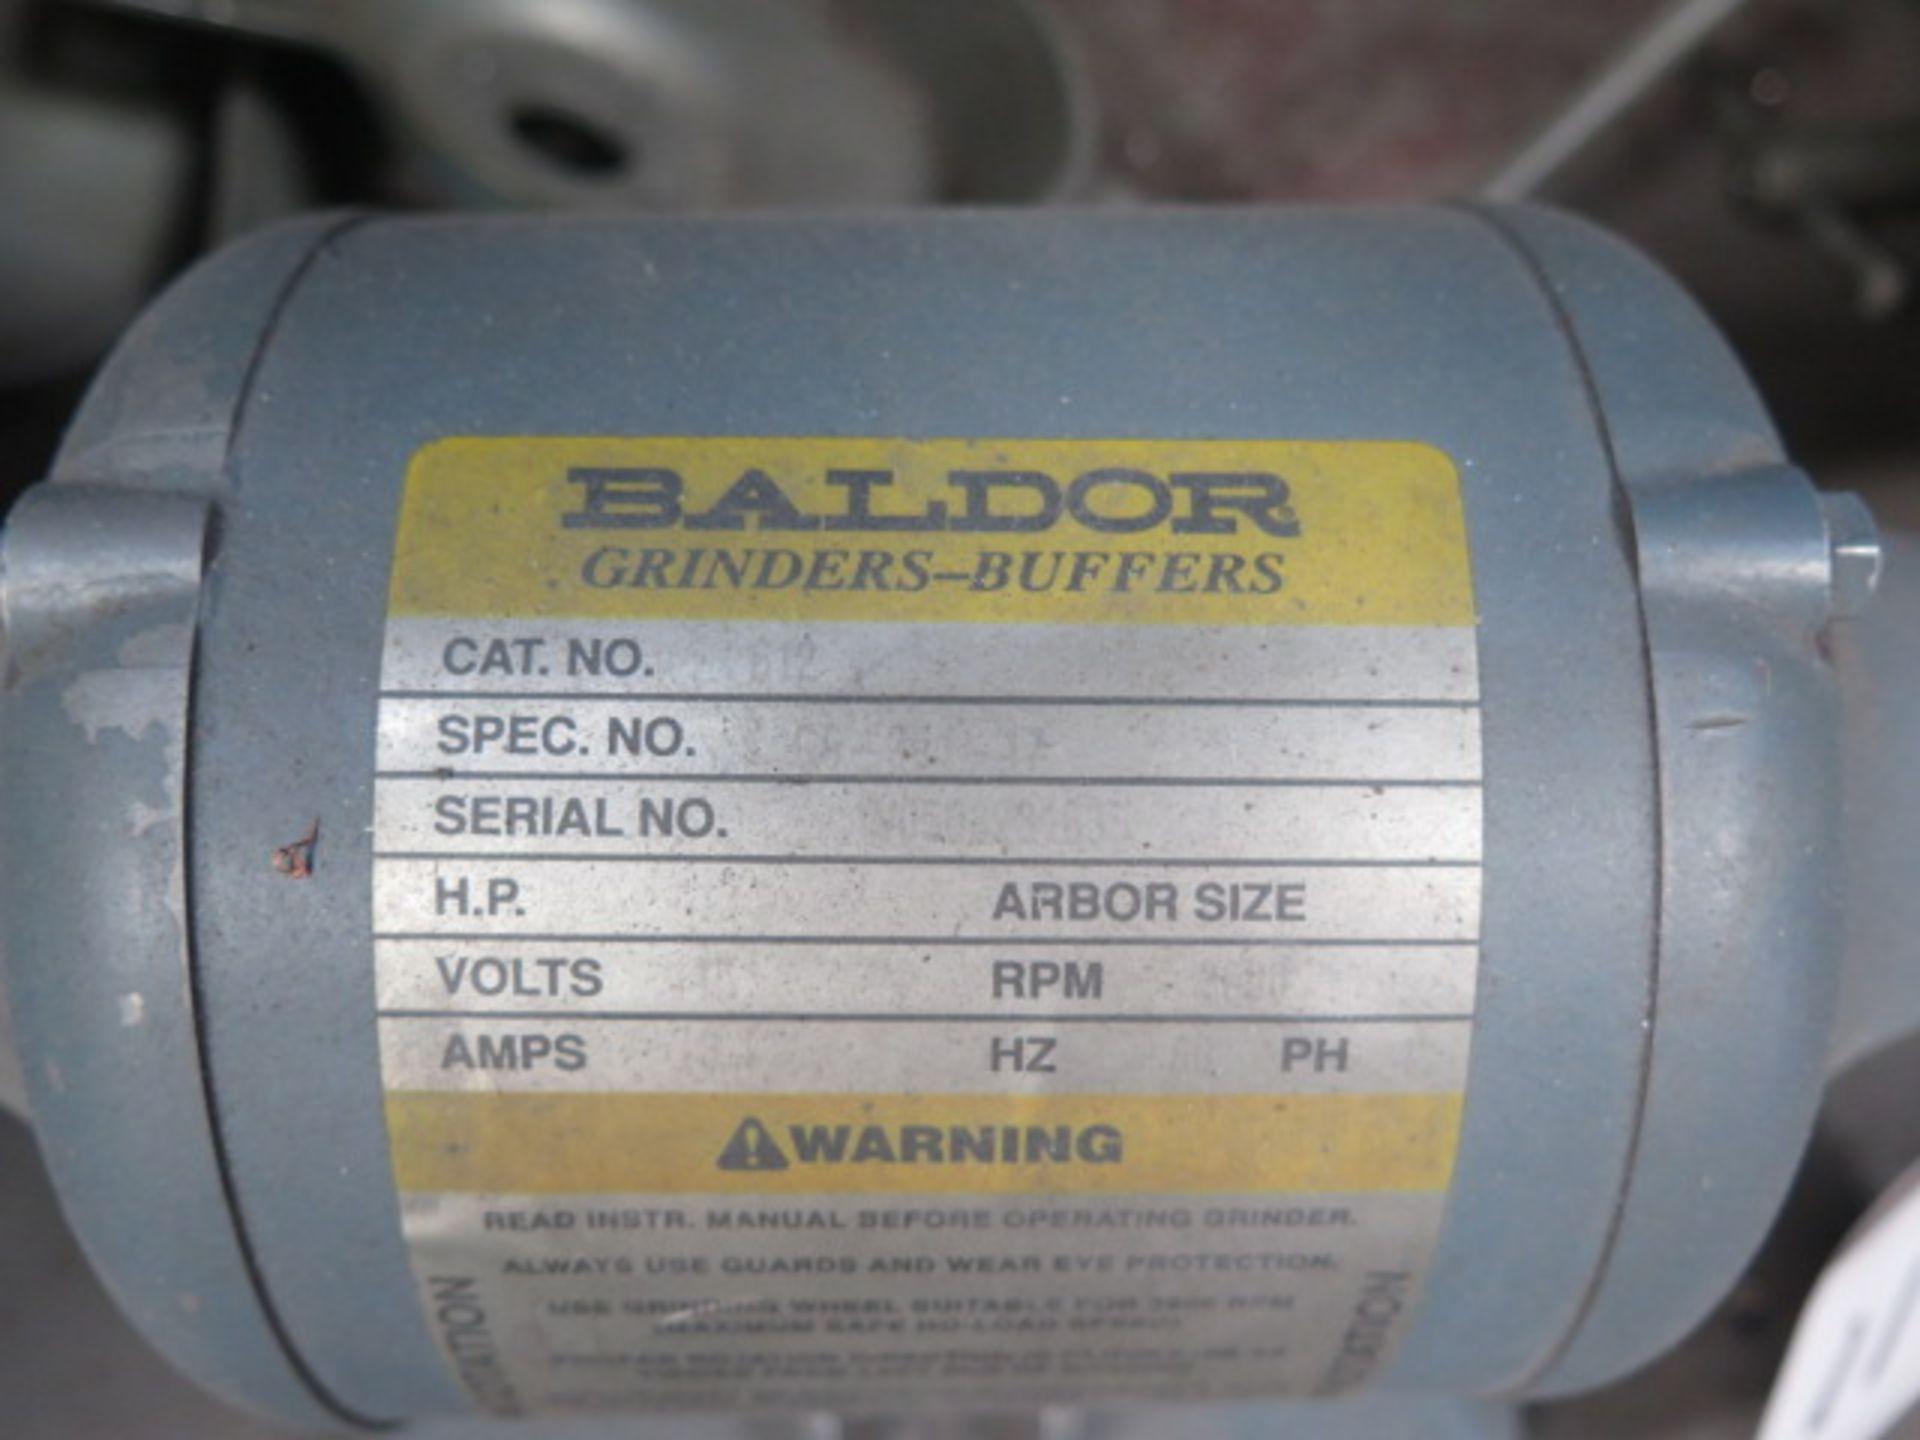 Baldor Bench Grinder (SOLD AS-IS - NO WARRANTY) - Image 2 of 4